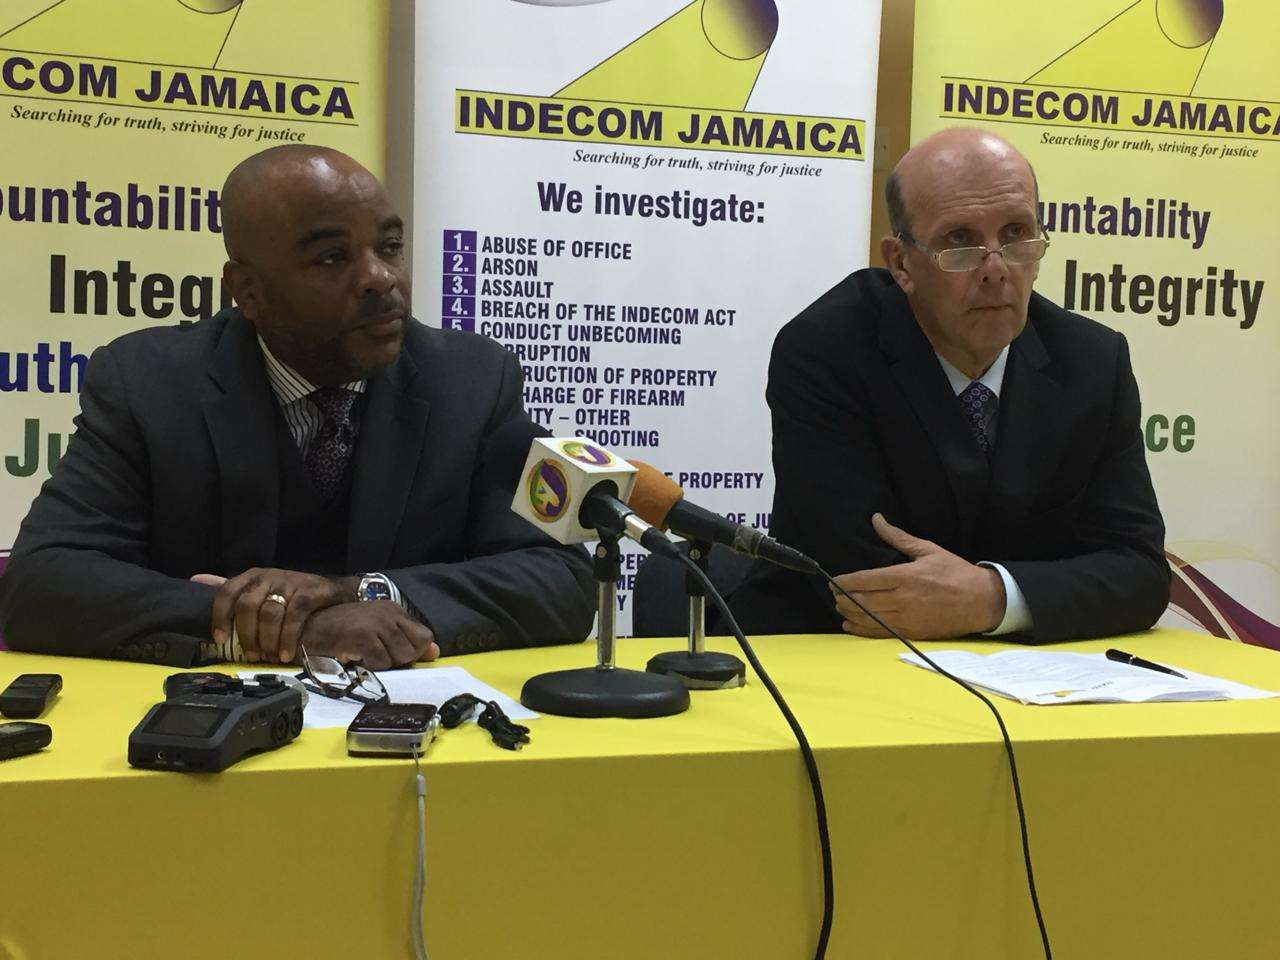 INDECOM Resists Criticisms of Overreach